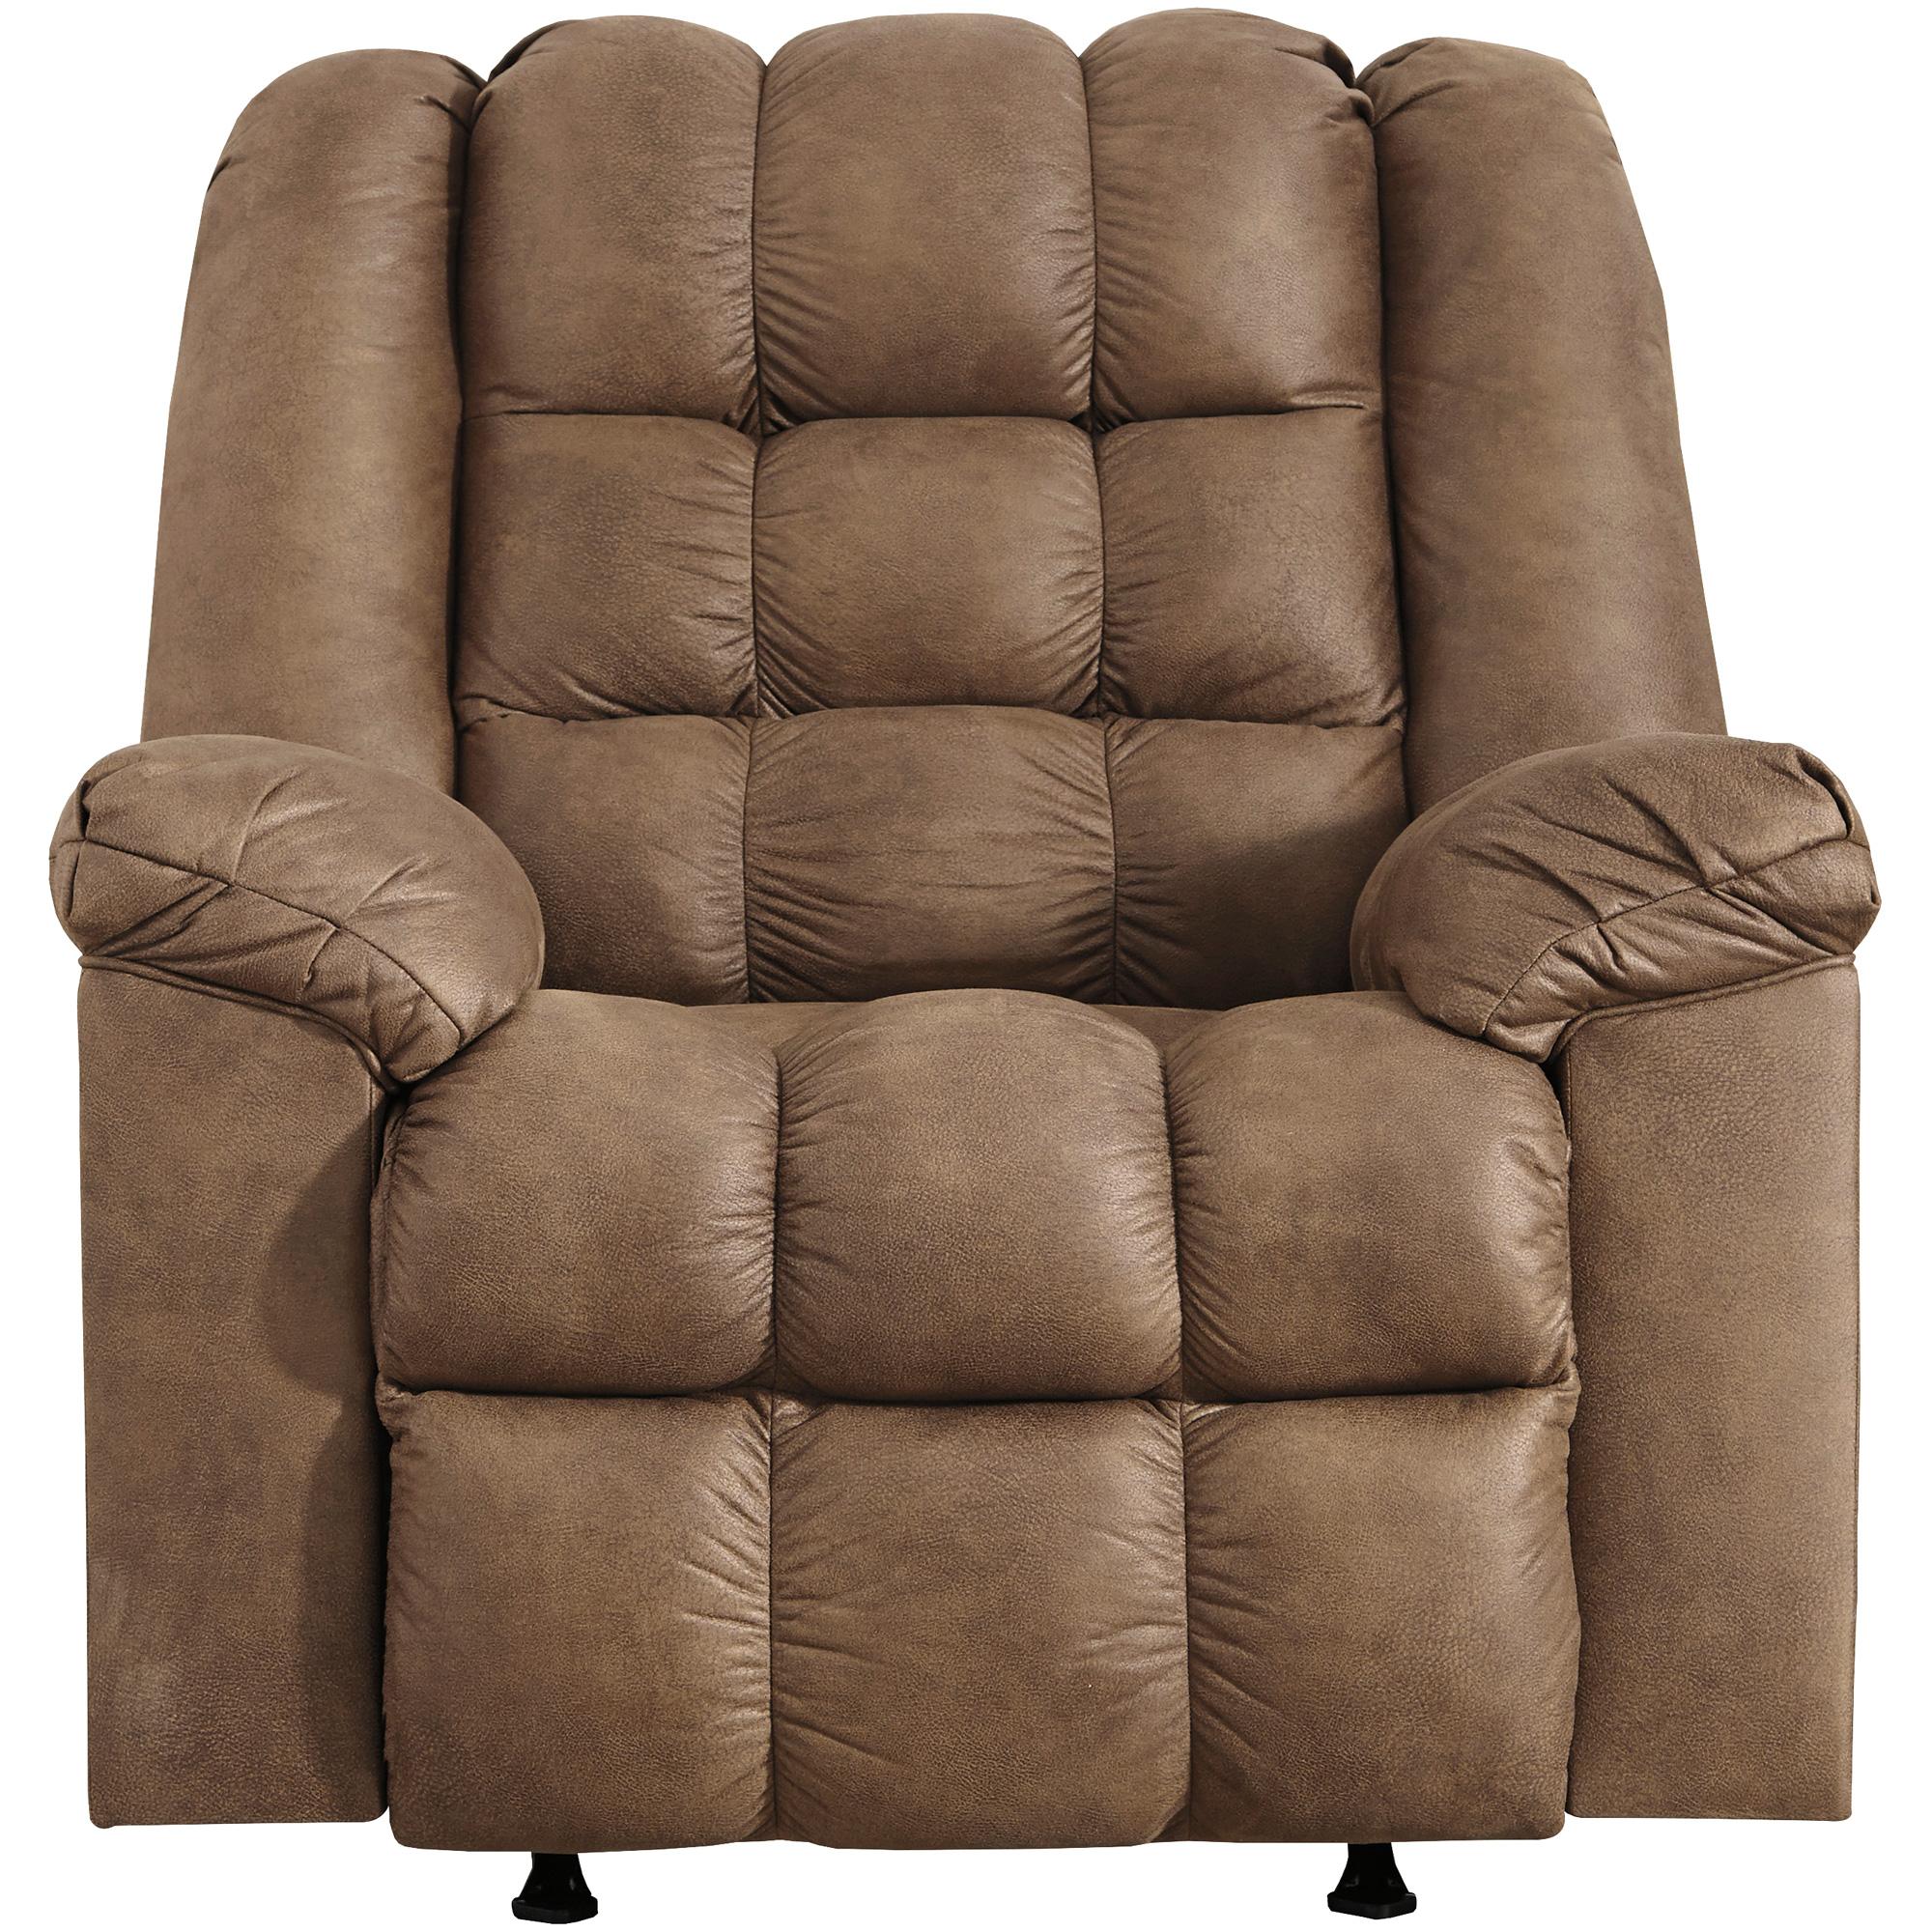 Ashley Furniture | Adrano Bark Rocker Recliner Chair | Brown